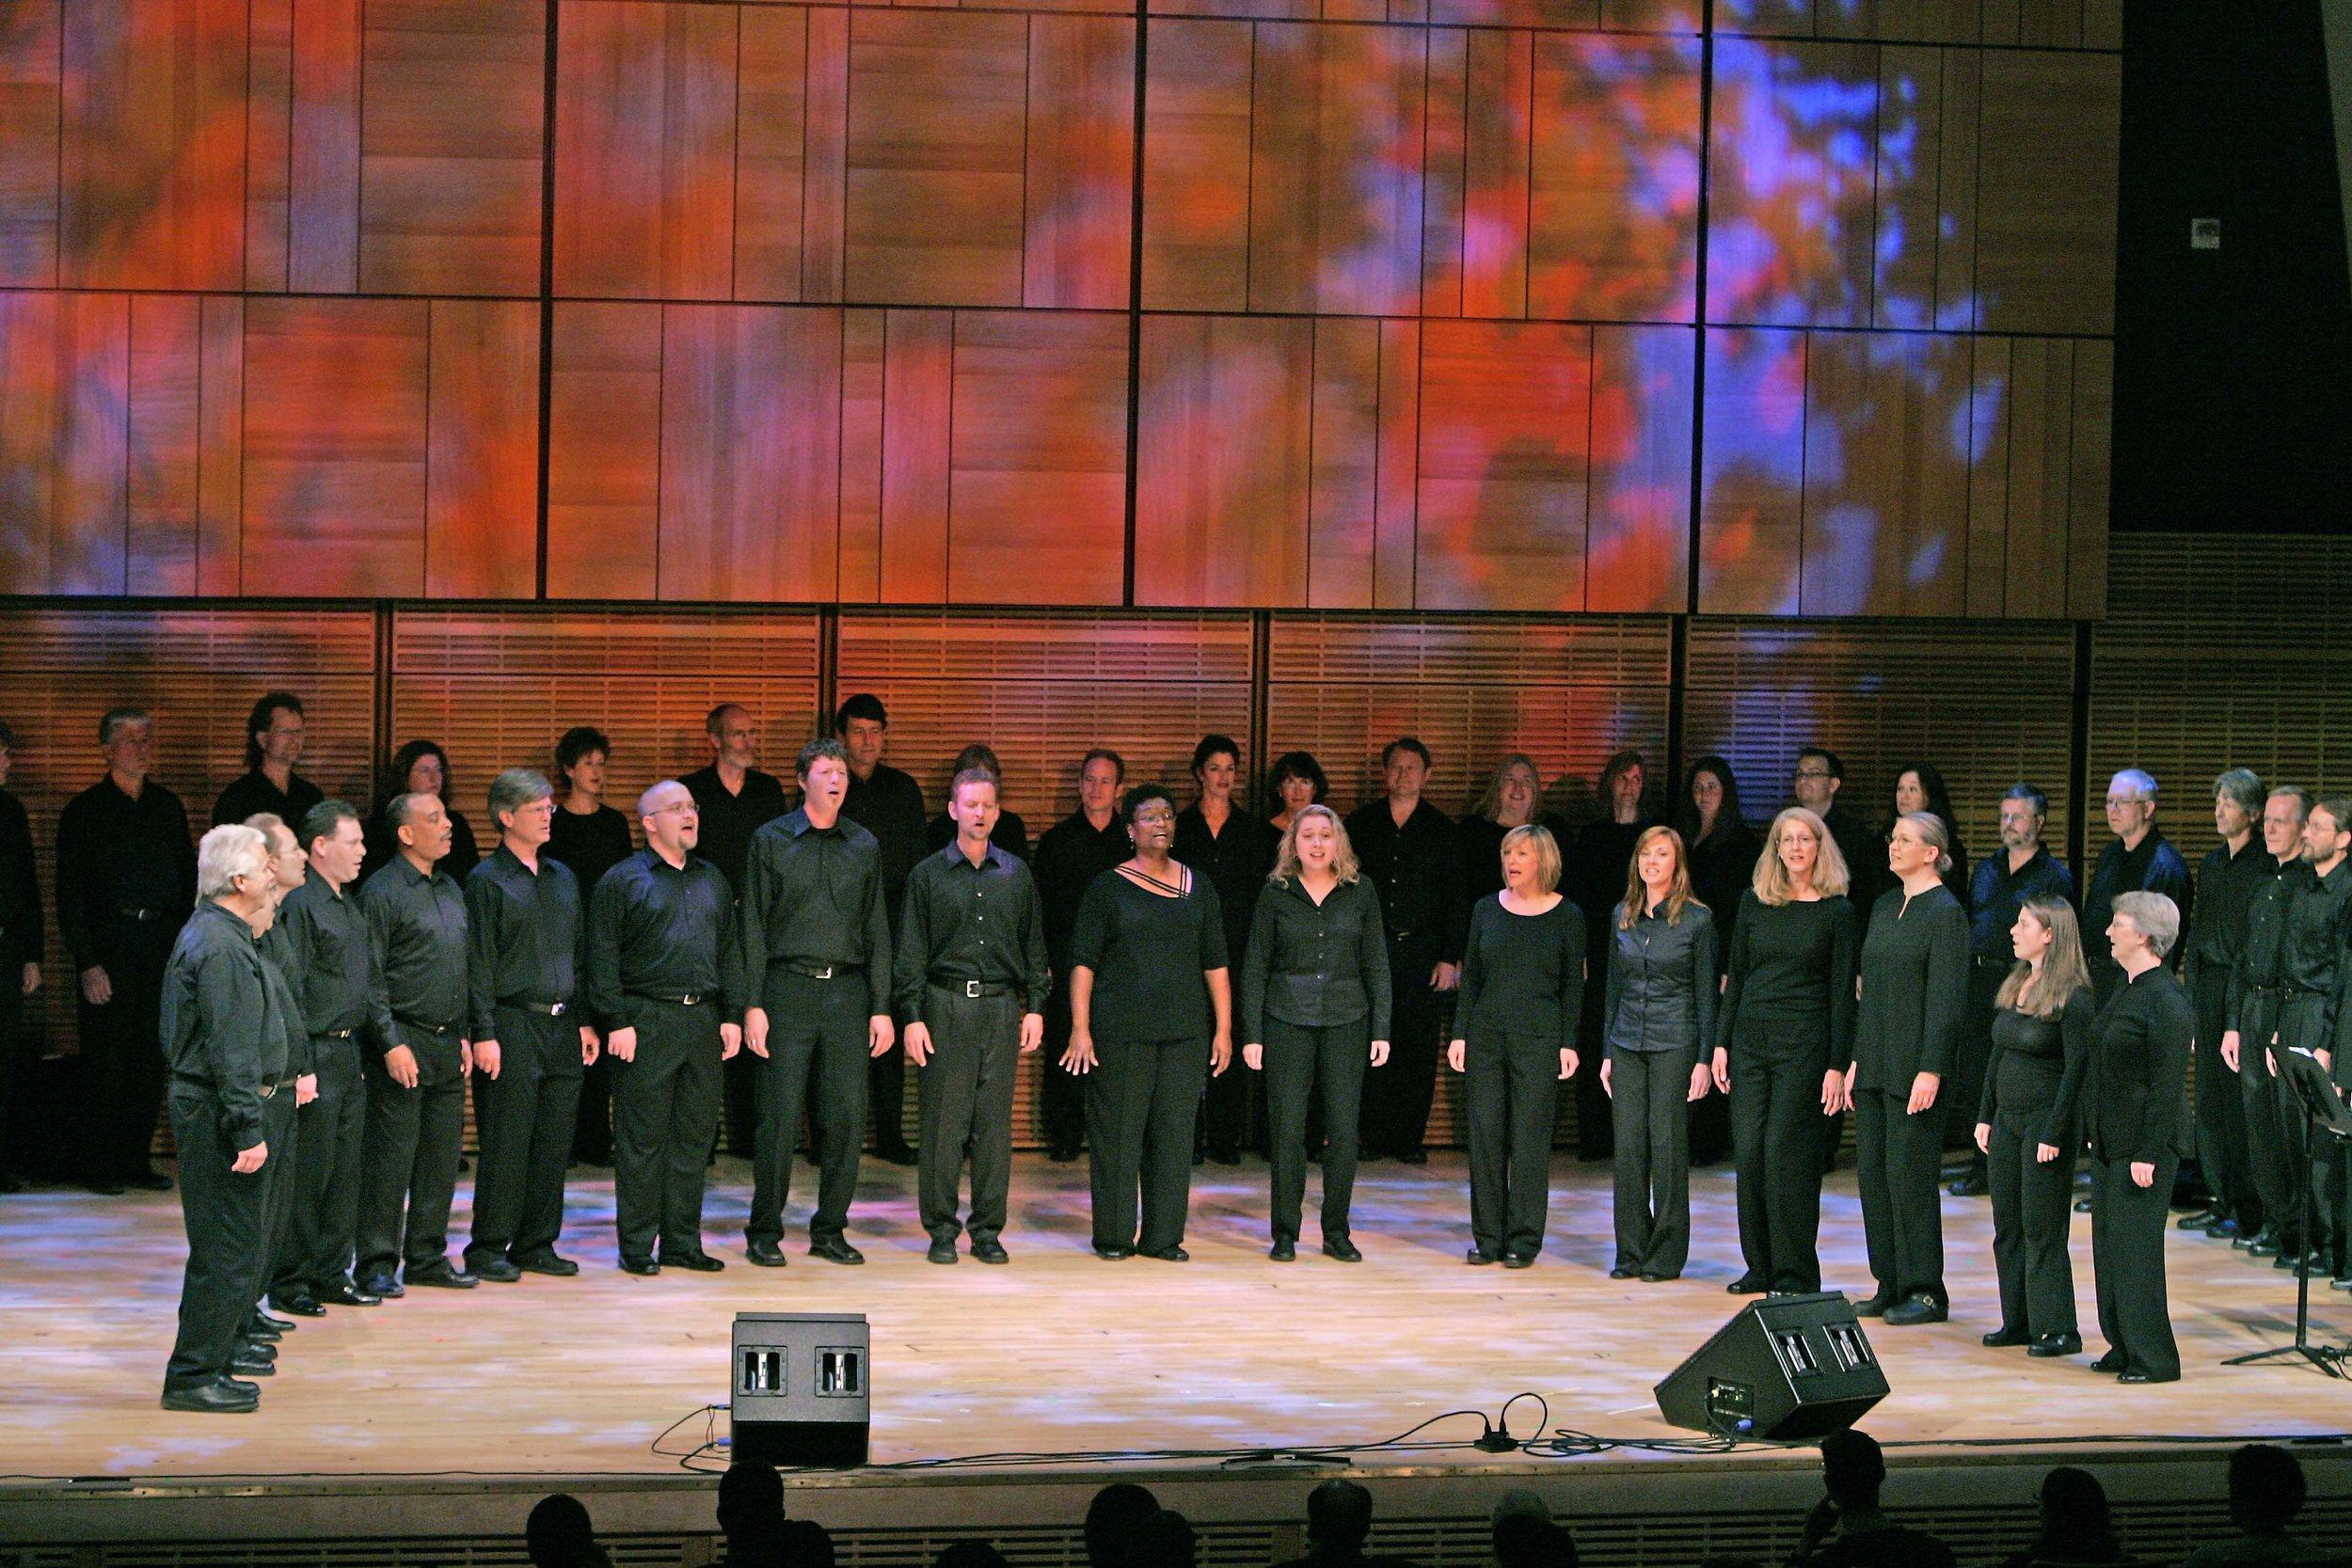 Celebration of Meredith Monk, Carnegie Hall (November 2005)